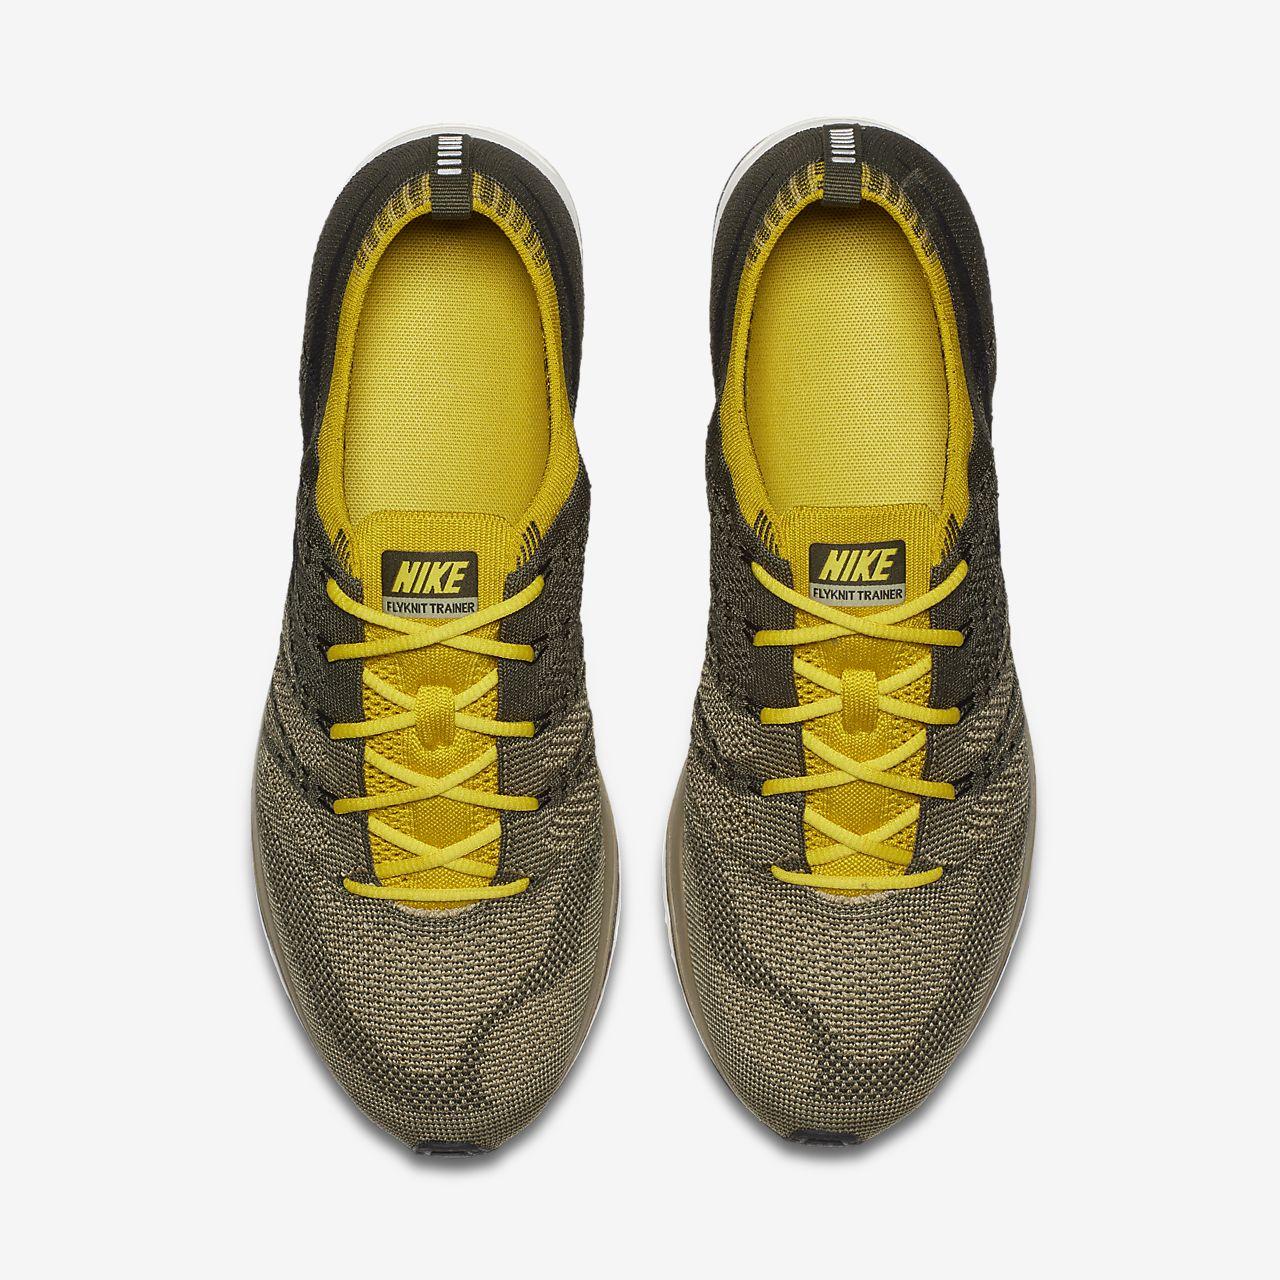 c515c43ec4f21 Nike Flyknit Trainer Unisex Shoe. Nike.com CA